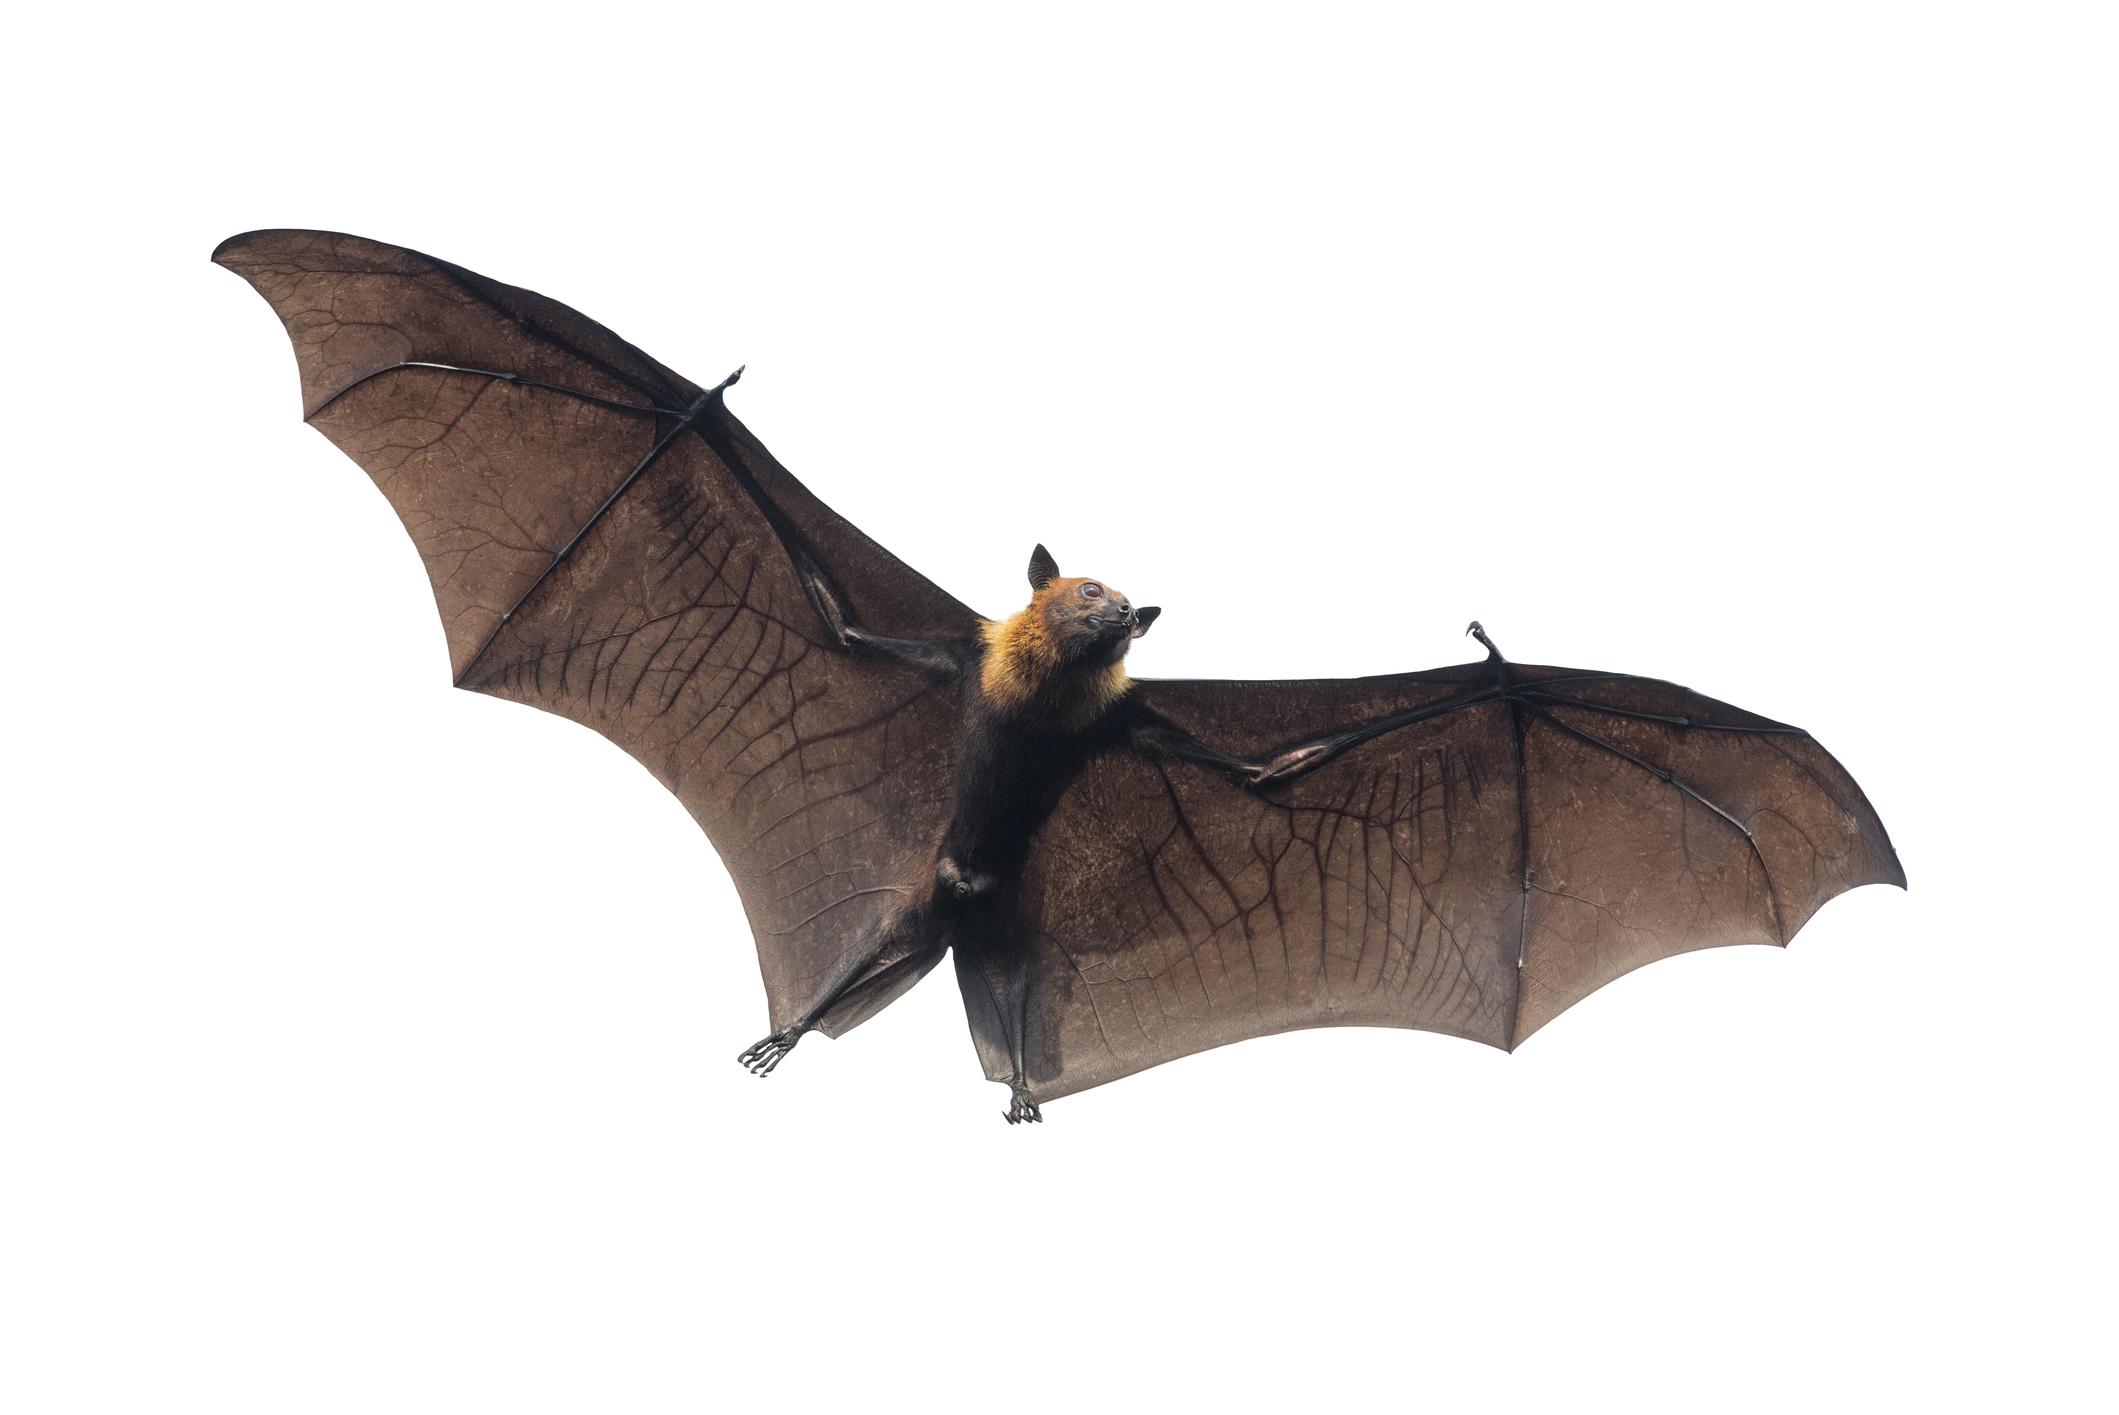 - Bat Exclusion